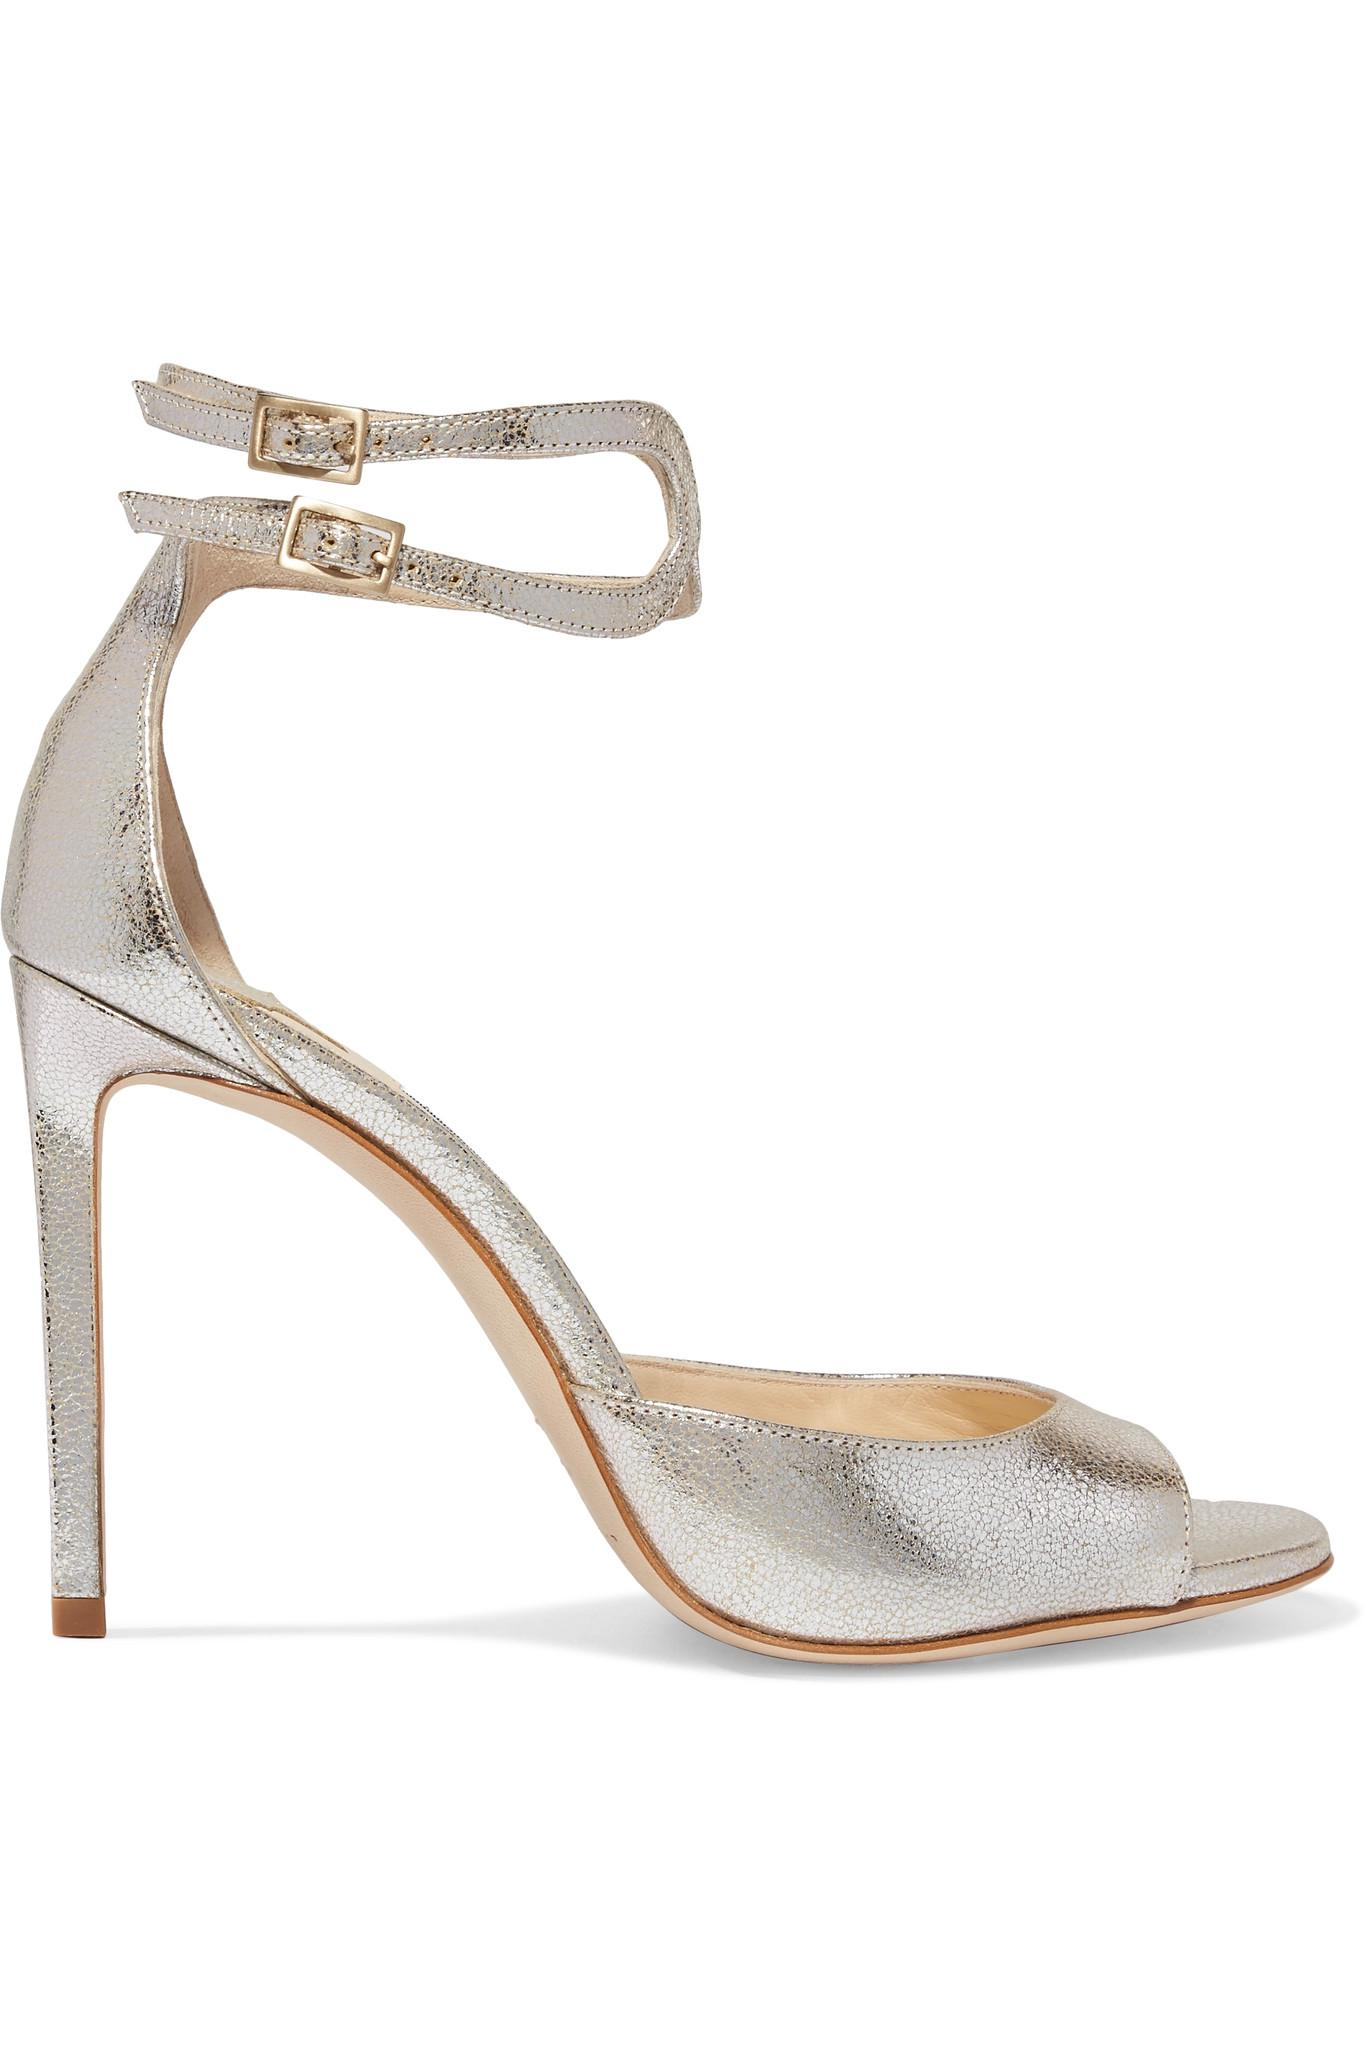 818556f6dfb0 Lyst - Jimmy Choo Lane 100 Metallic Cracked-leather Sandals in Metallic